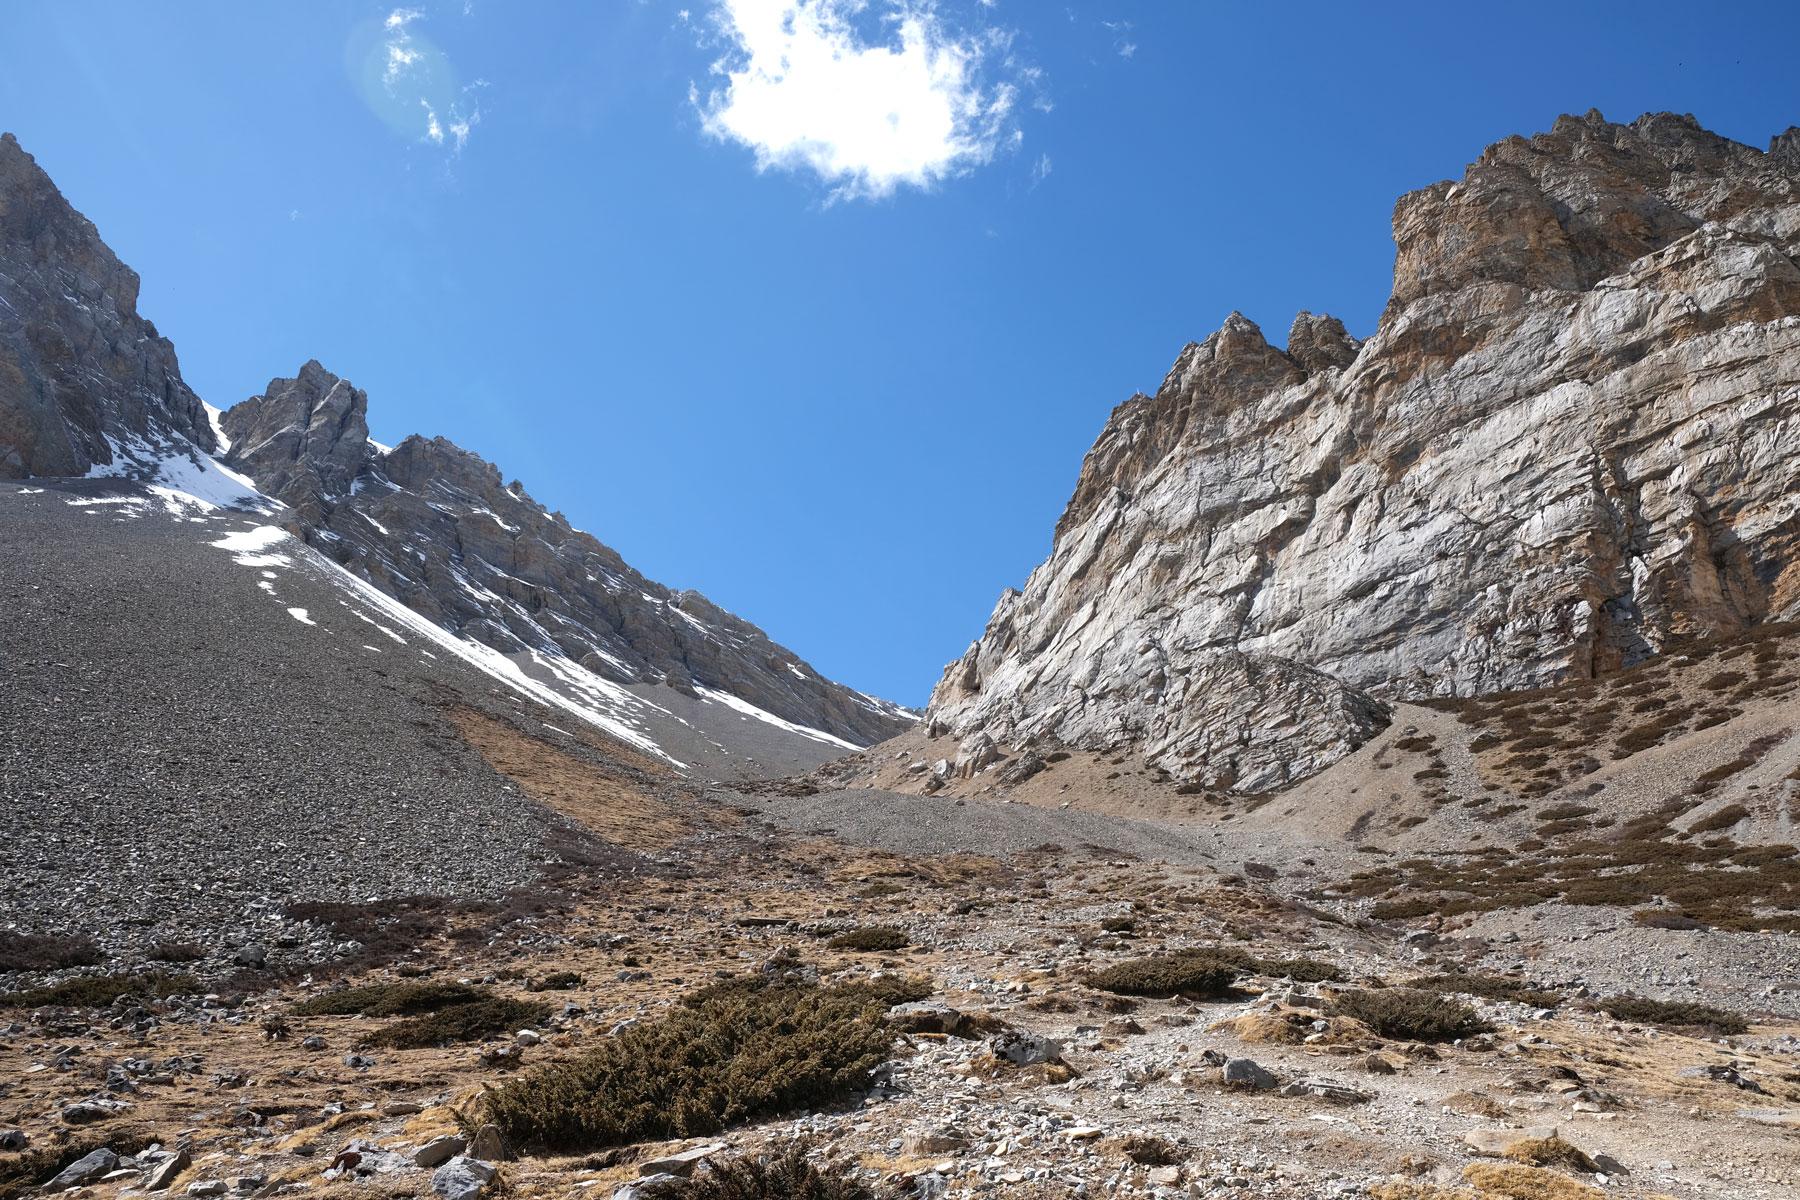 Wanderweg zum High Camp auf dem Annapurna Circuit.